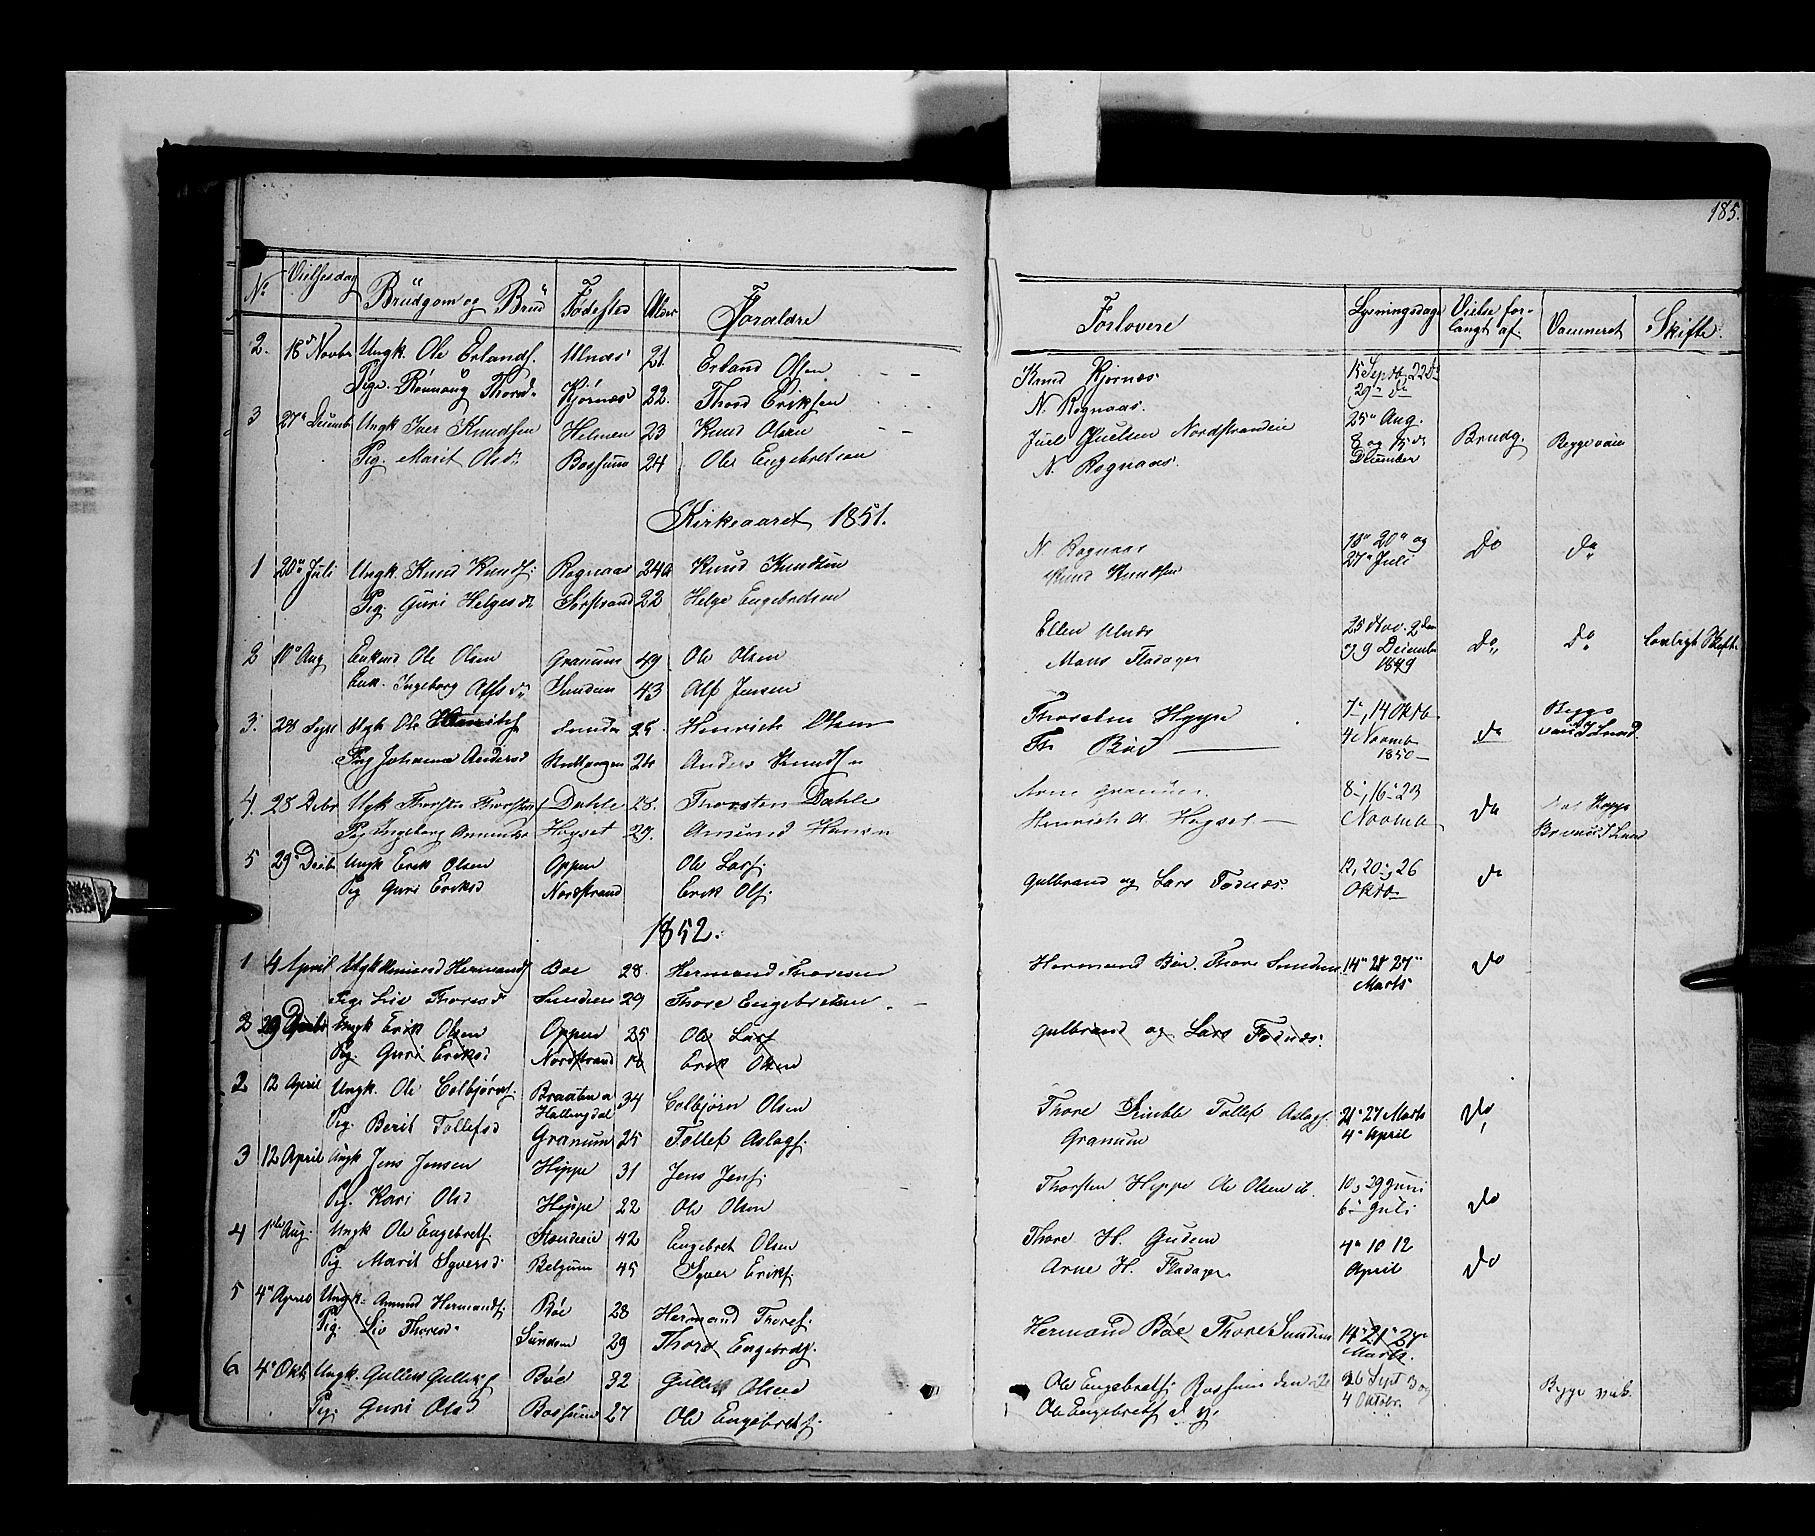 SAH, Nord-Aurdal prestekontor, Ministerialbok nr. 6, 1842-1863, s. 185